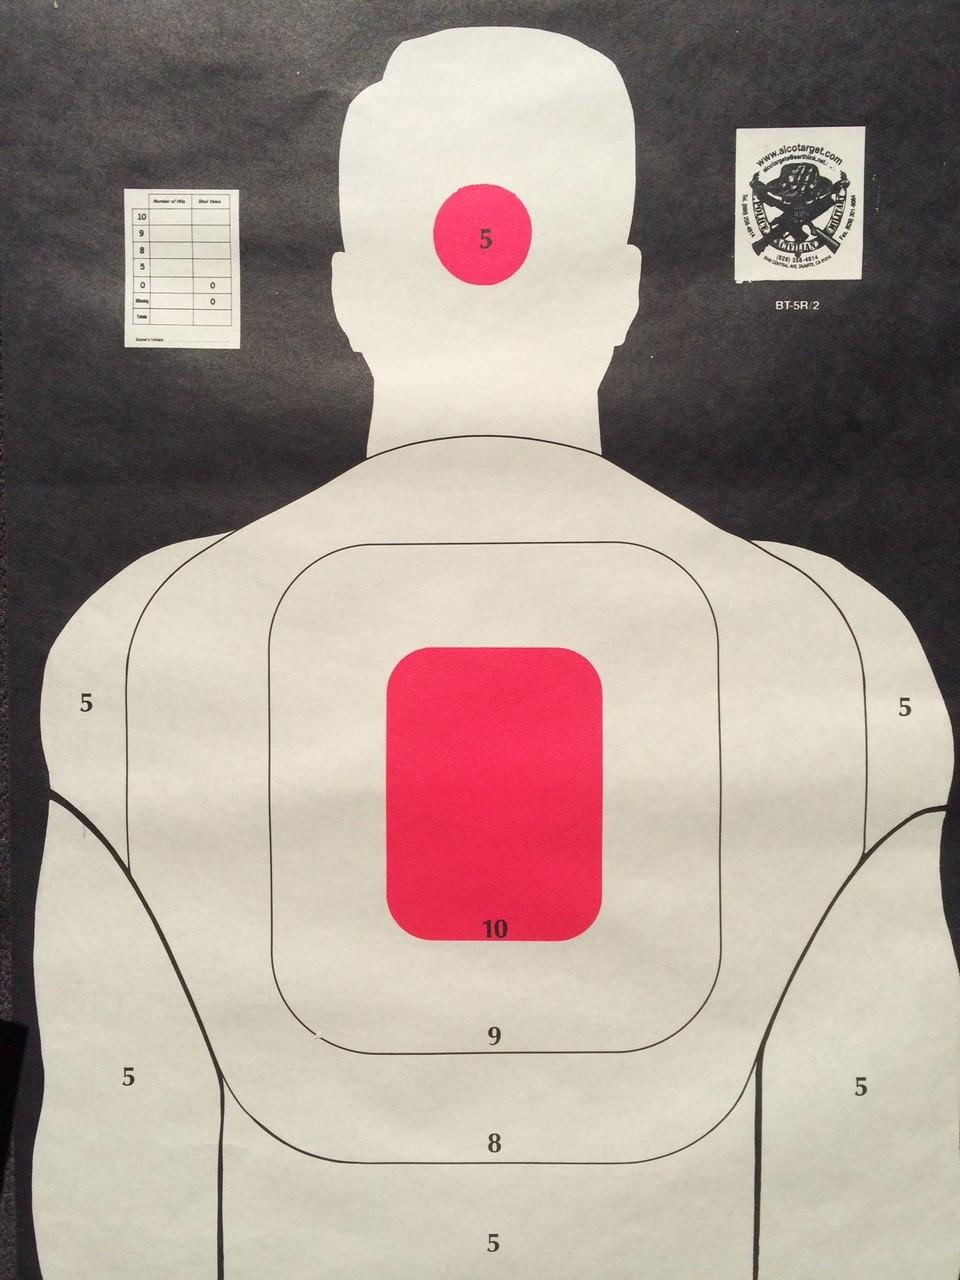 BT-5 Head Shot Variety Pack B Shooting Target